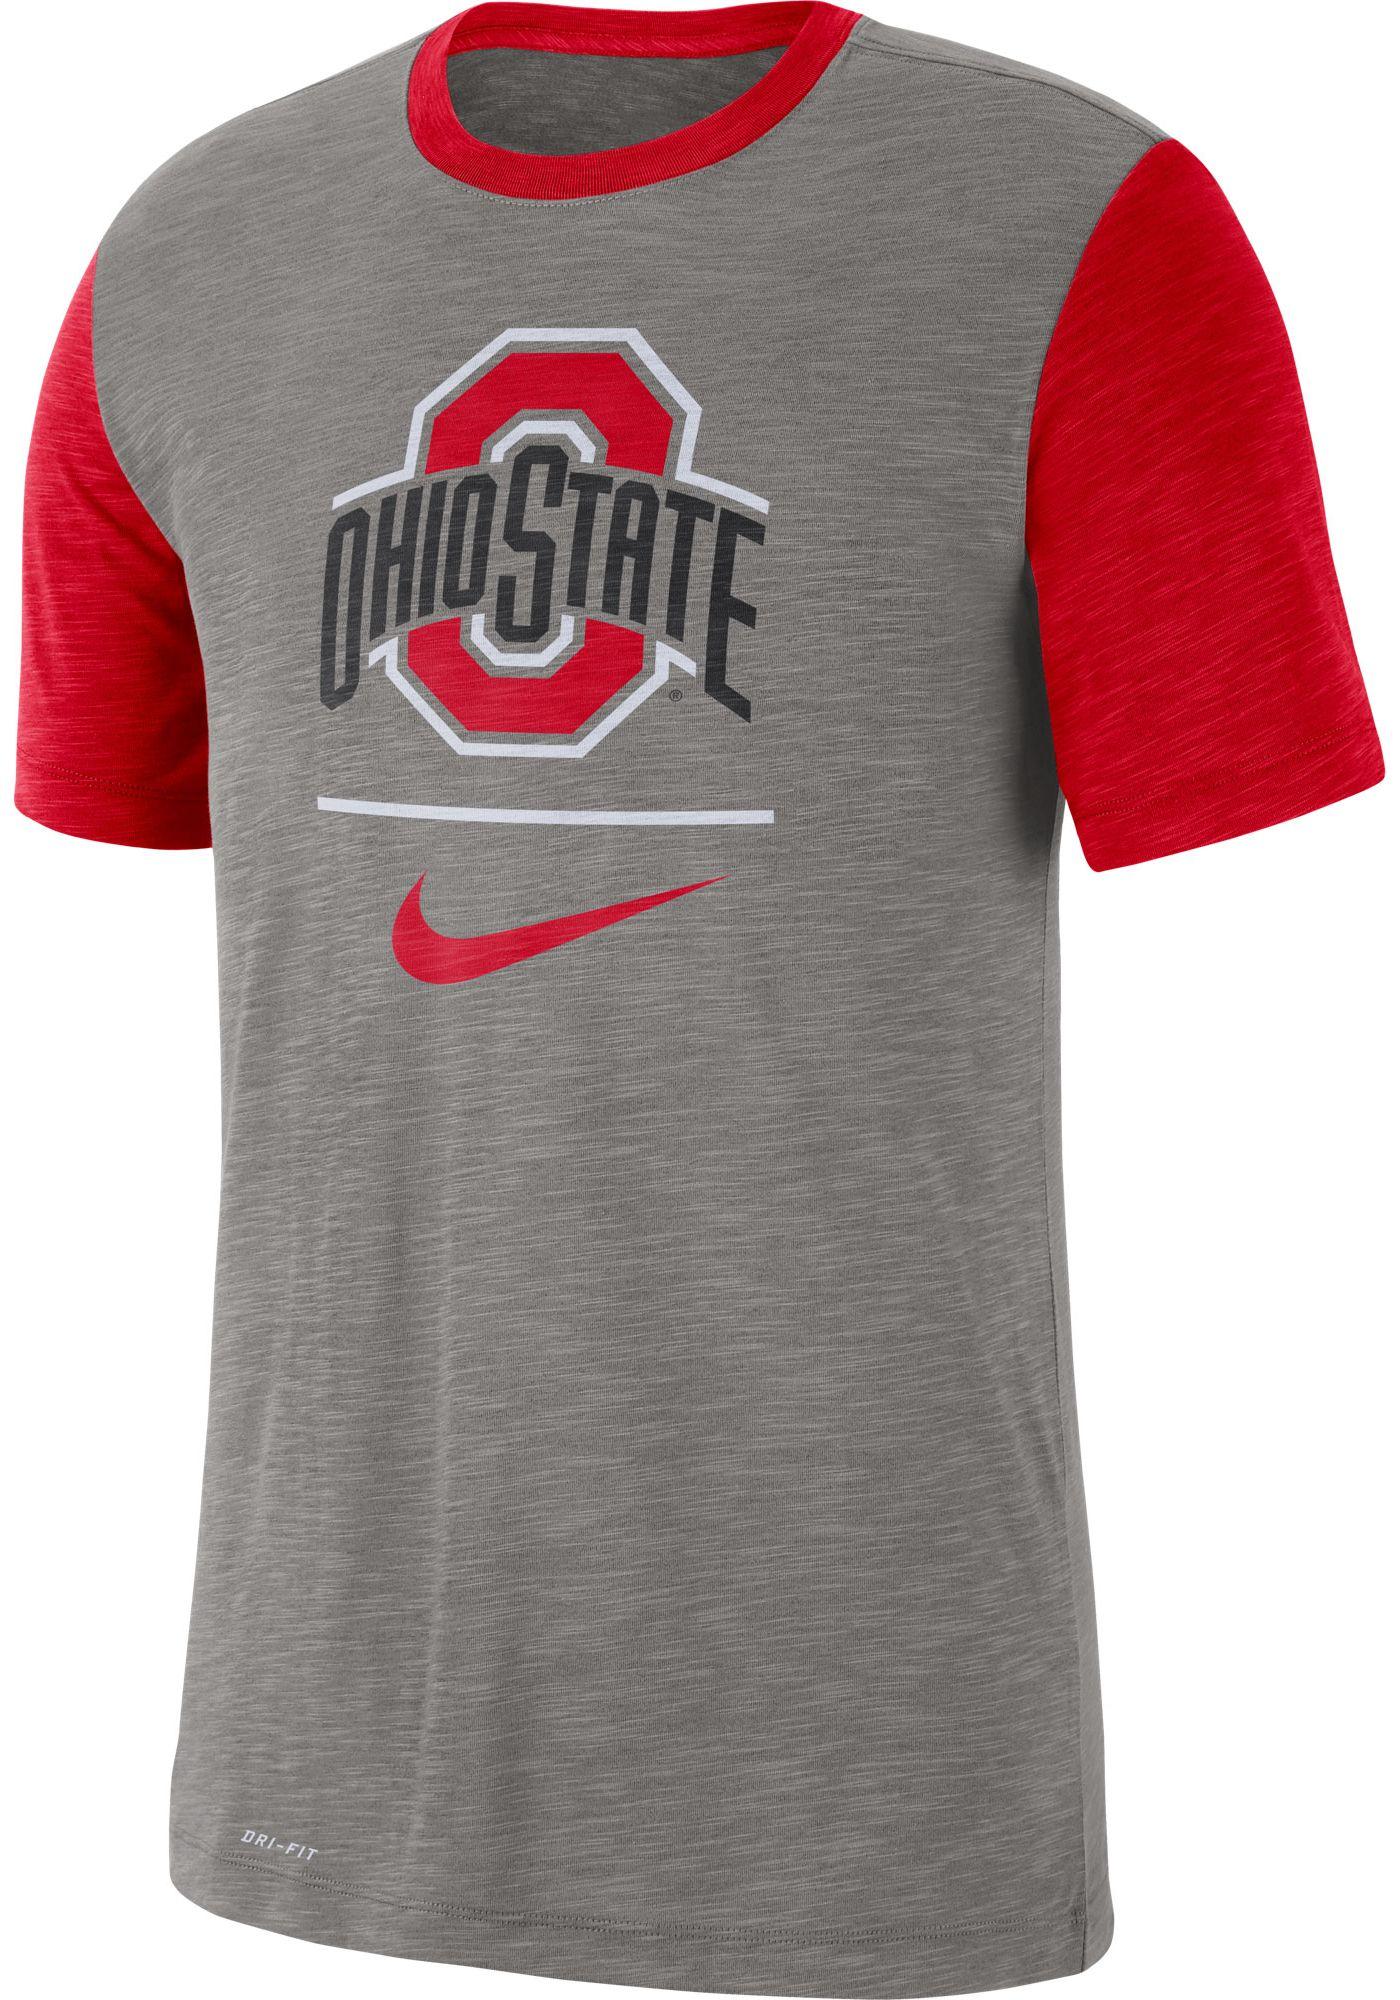 Nike Men's Ohio State Buckeyes Grey Dri-FIT Baseball Slub T-Shirt